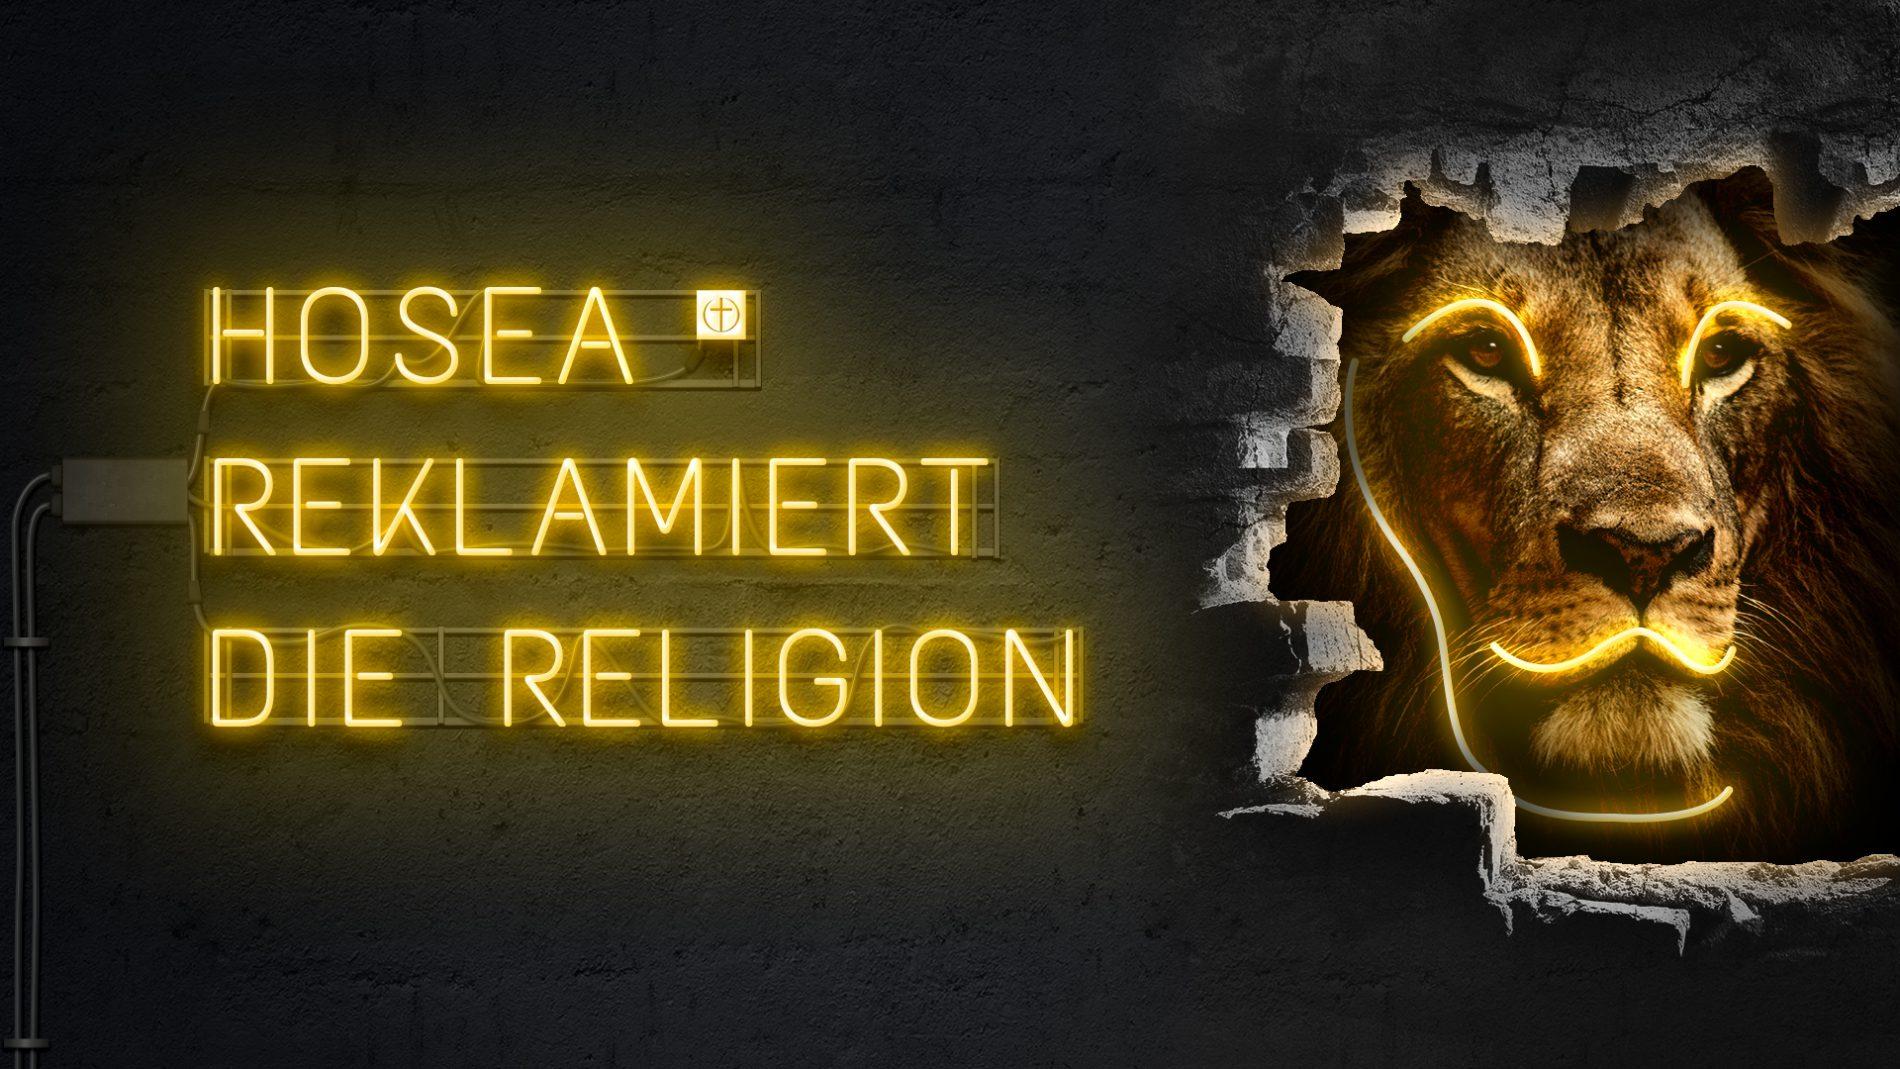 Hosea reklamiert die Religion (Zwölf Propheten: I)